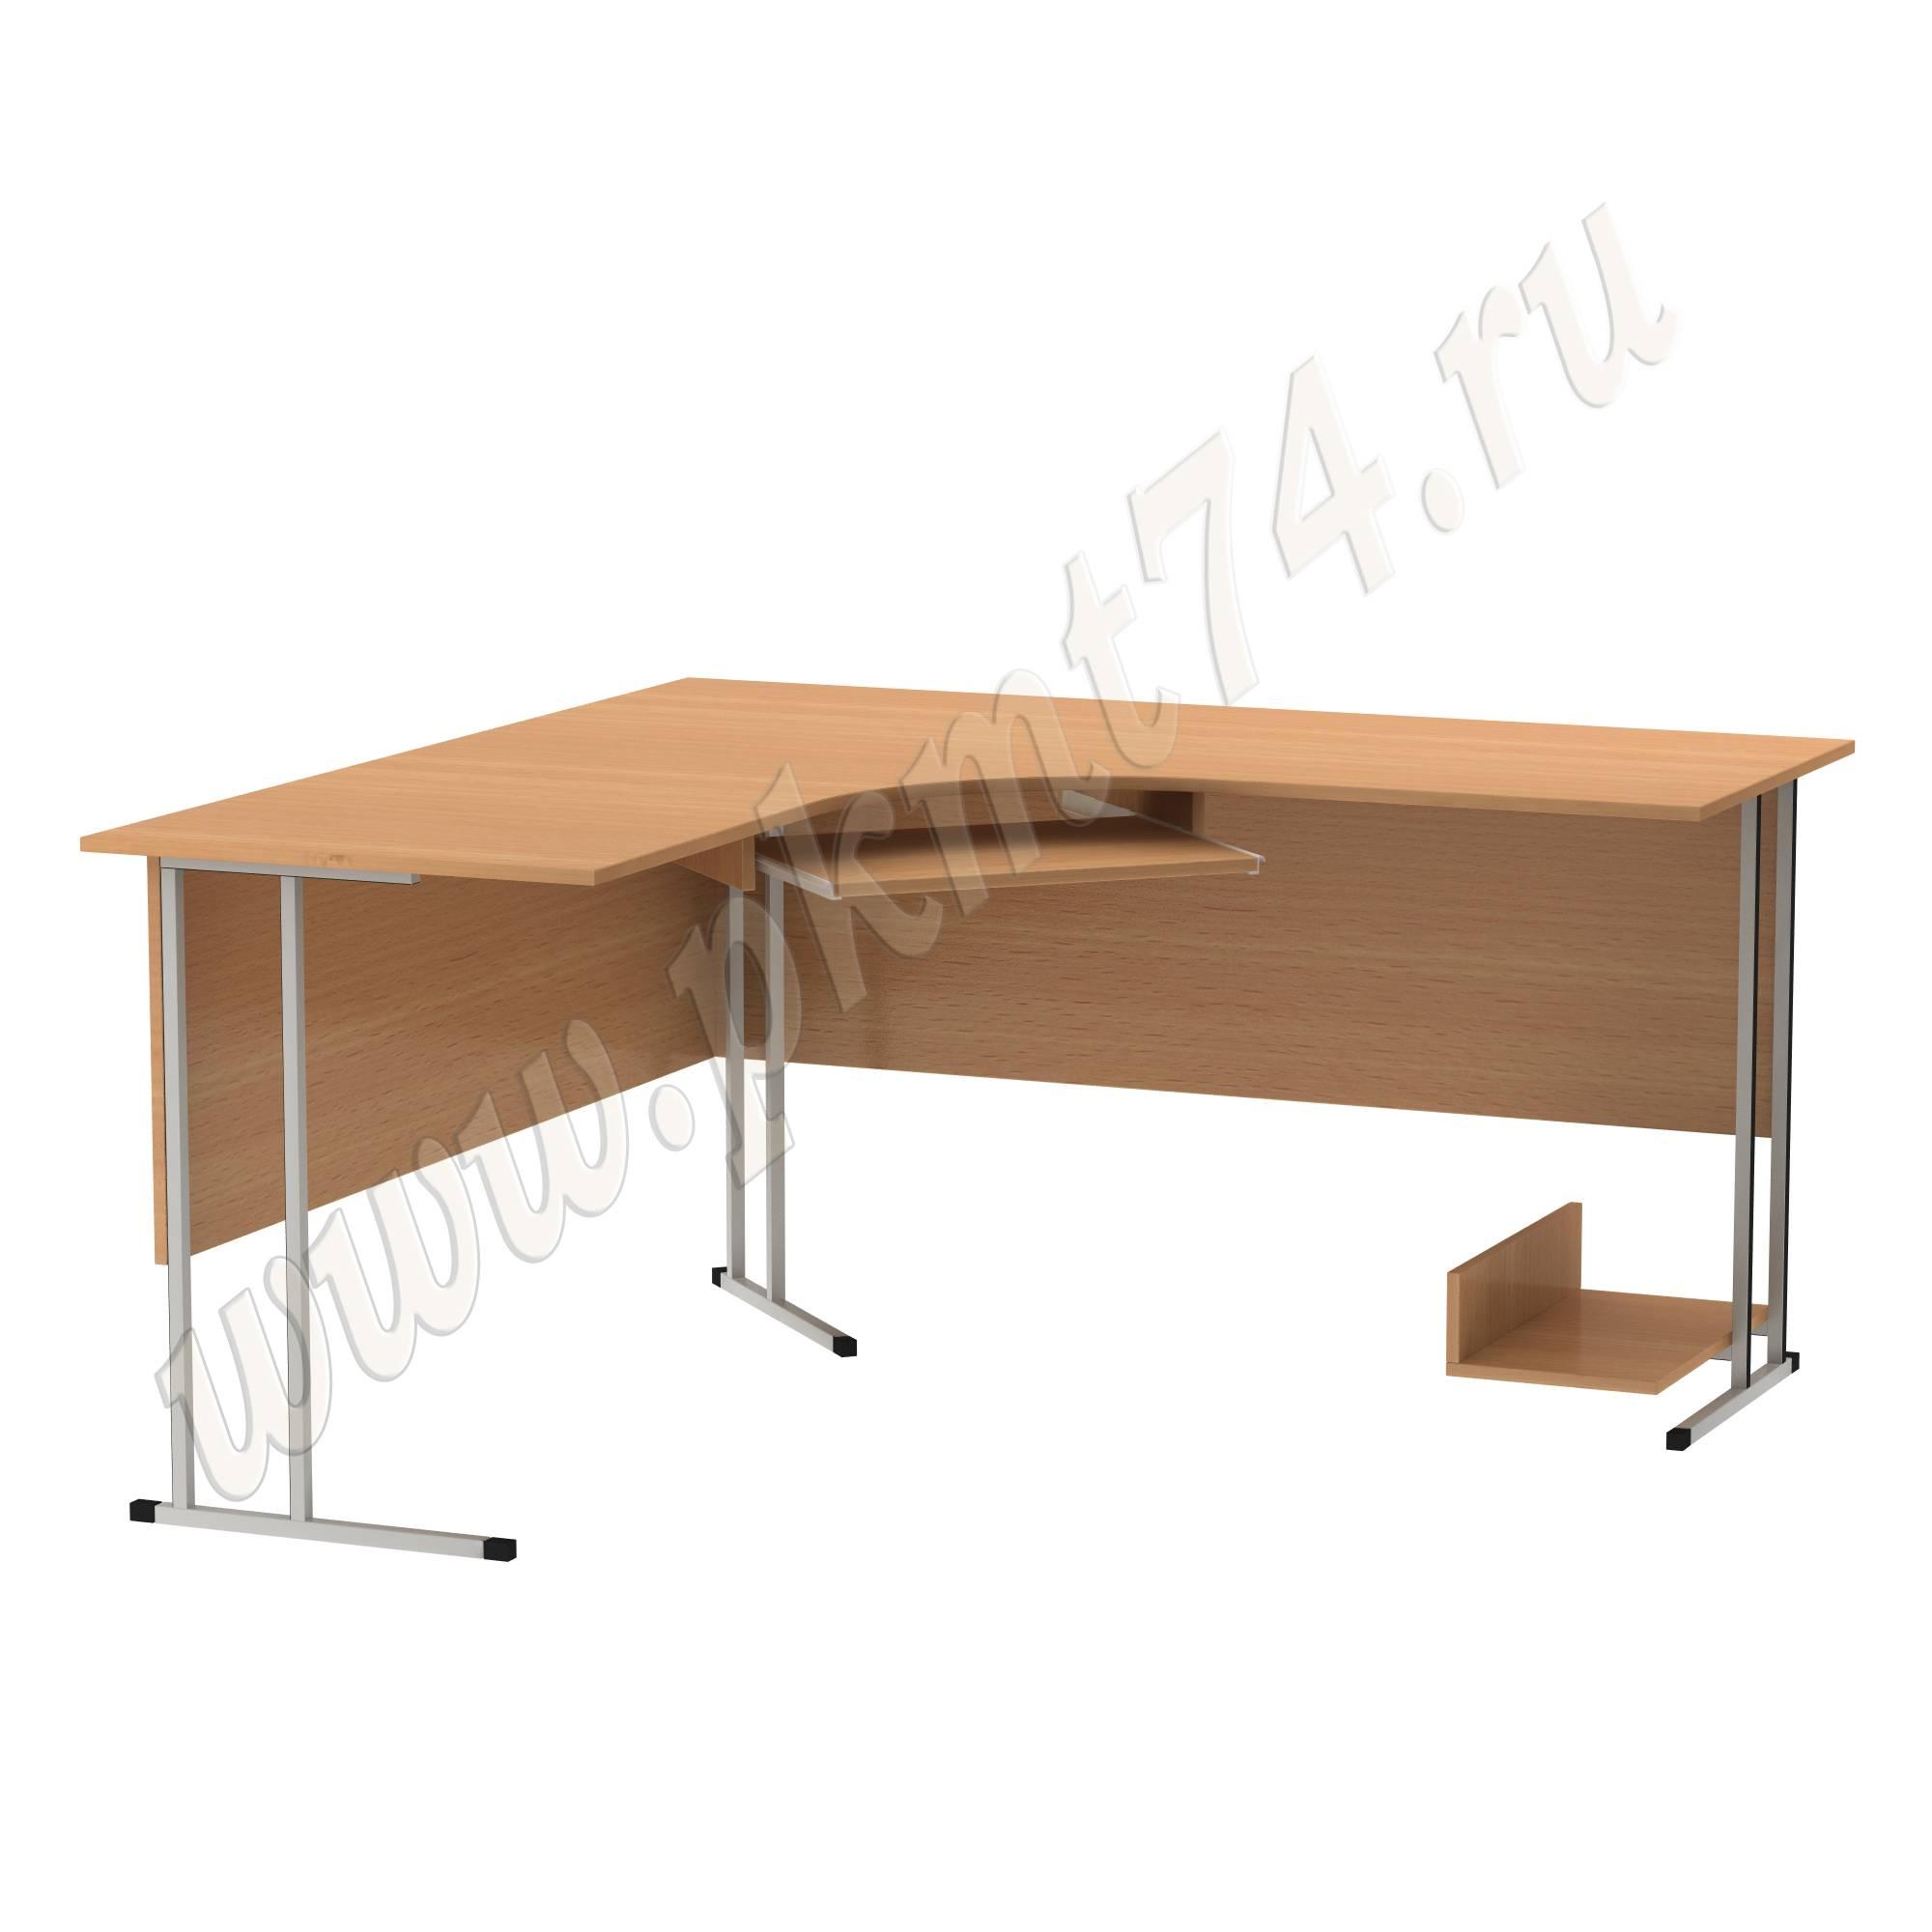 Стол компьютерный угловой на металлокаркасе МТ 07-10 Бук